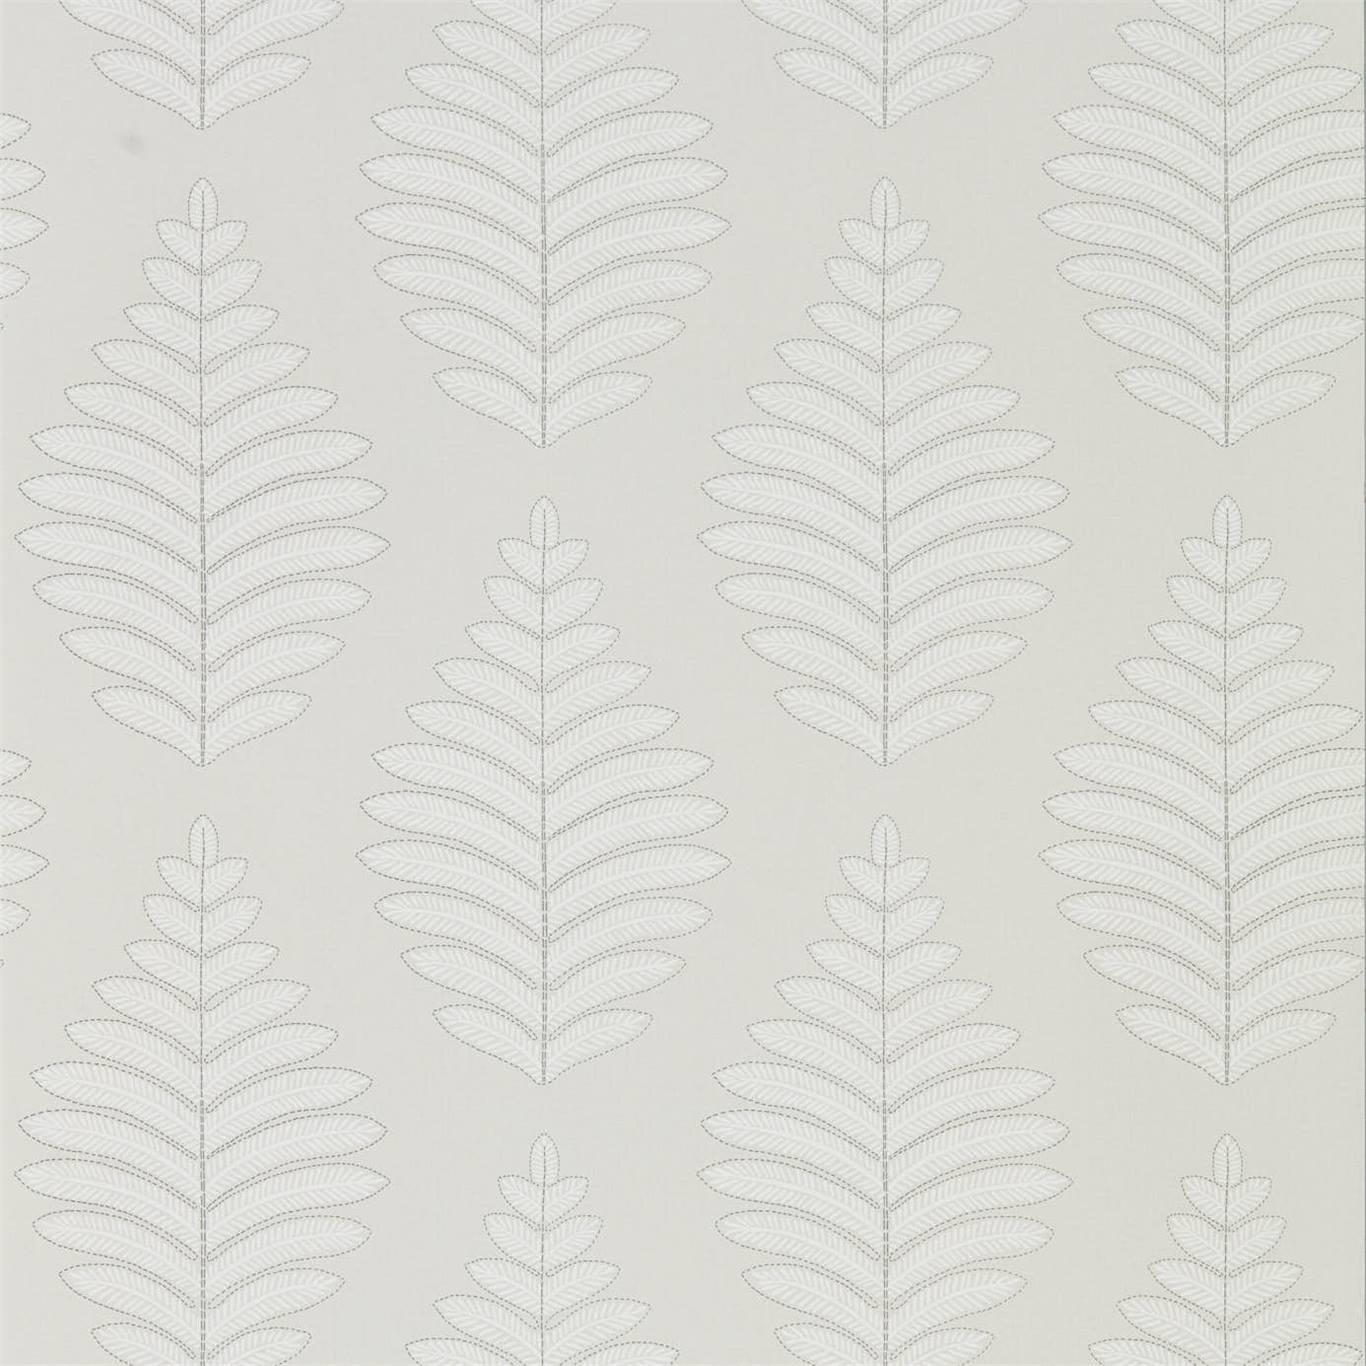 Image of Harlequin Lucielle Linen/Silver Wallpaper 111898